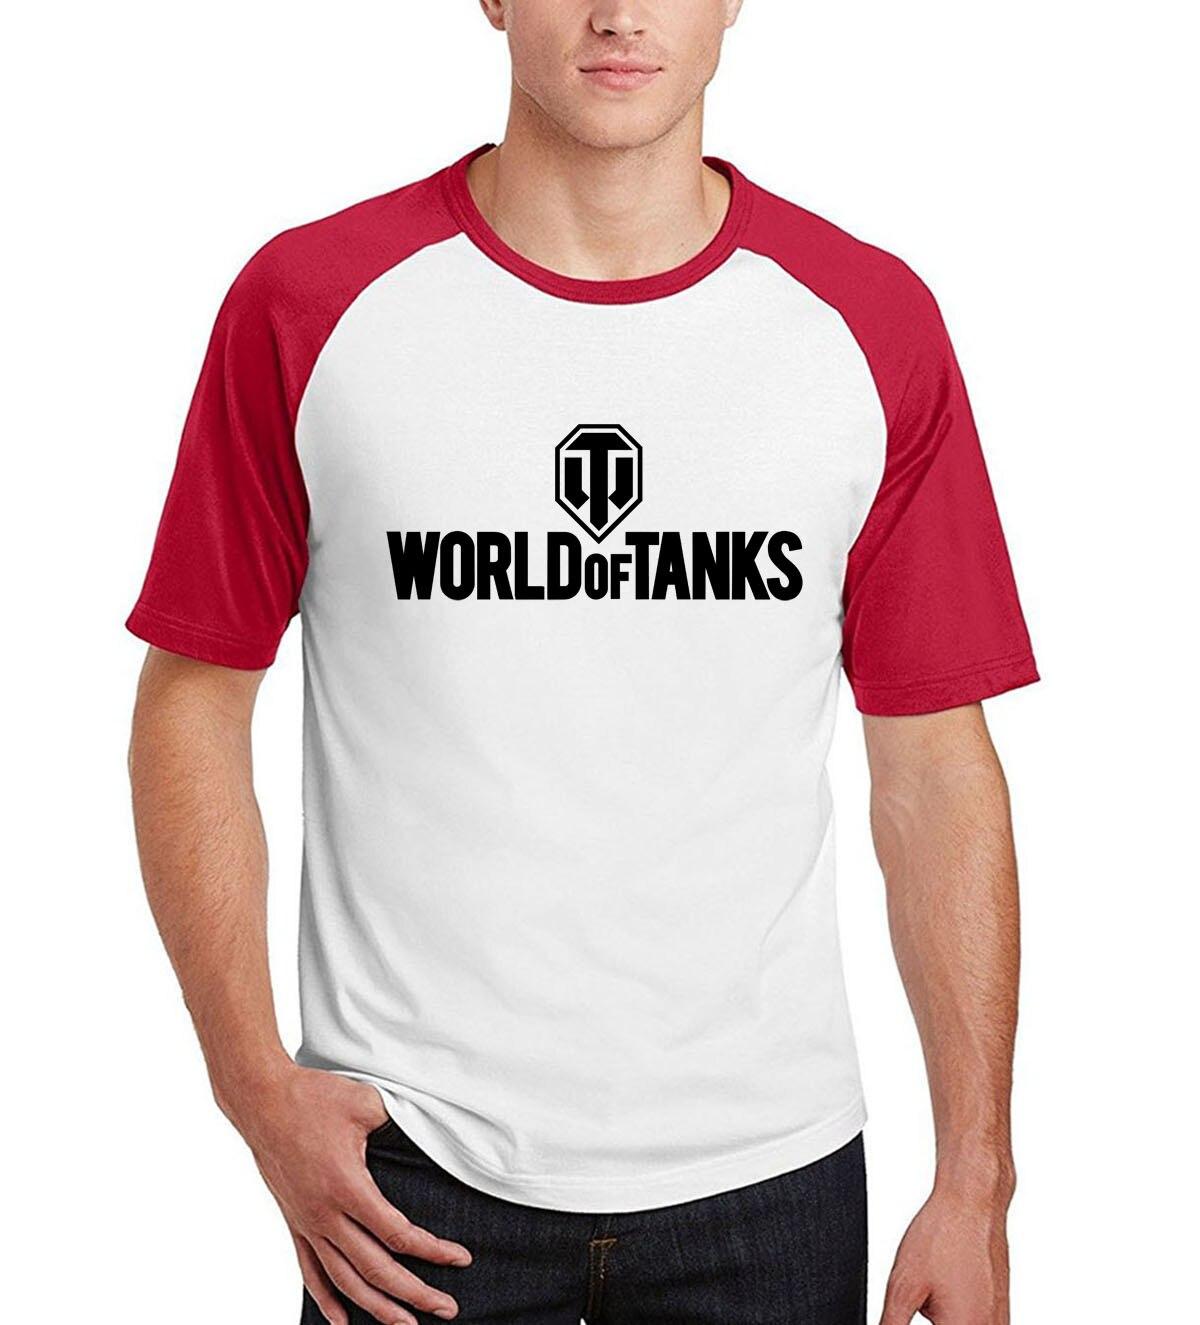 raglan short sleeve Tops male 2019 summer style bodybuilding T Shirt men World War ii Tank camisetas hip-hop brand clothing pp